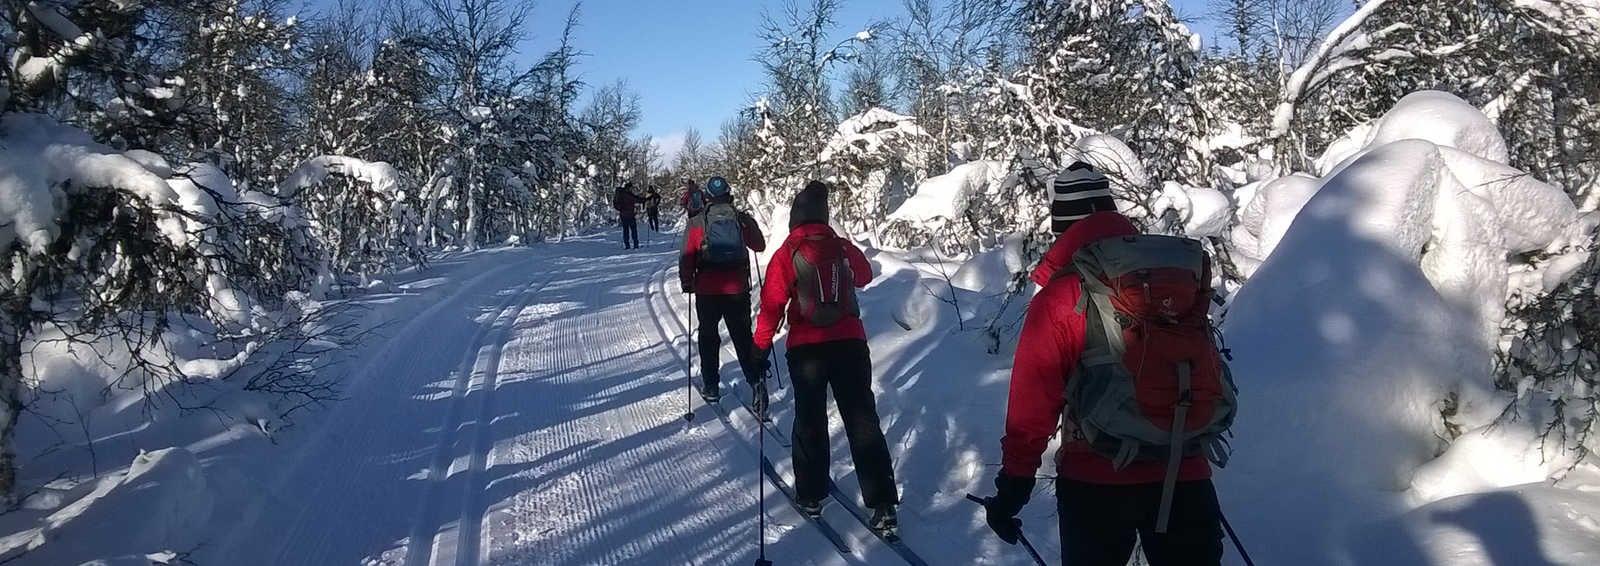 Cross-country skiing in Trimloipe in Venabu mountains